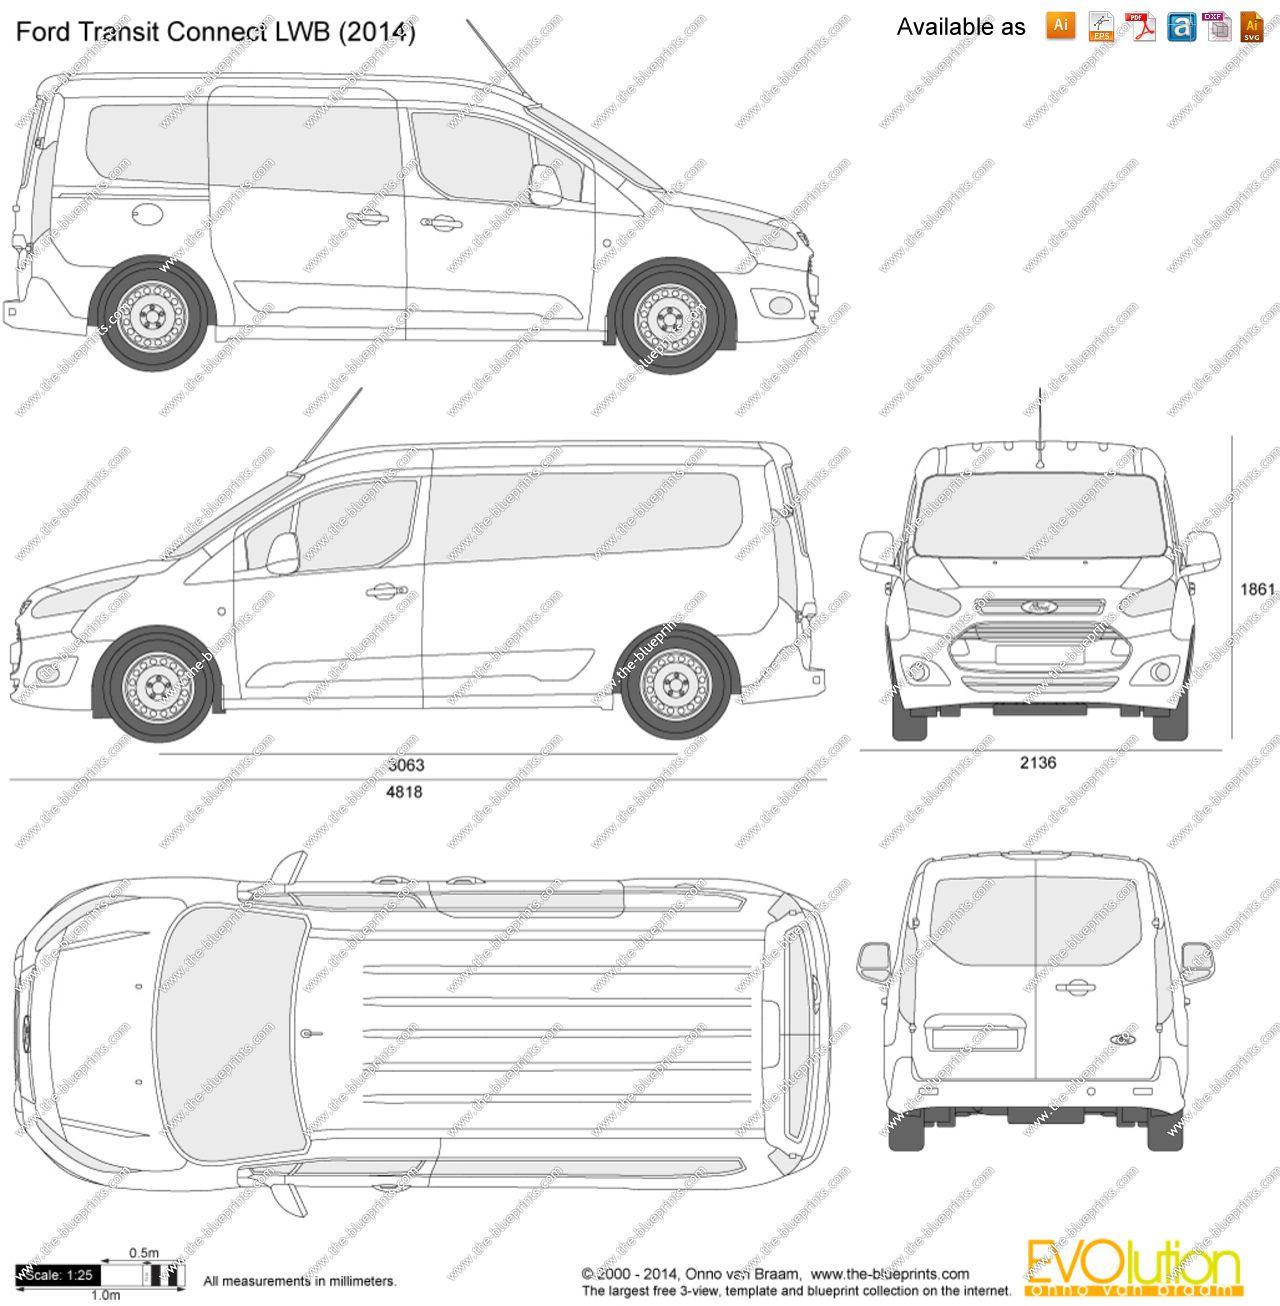 Ford Transit Connect Lwb Dimenzije